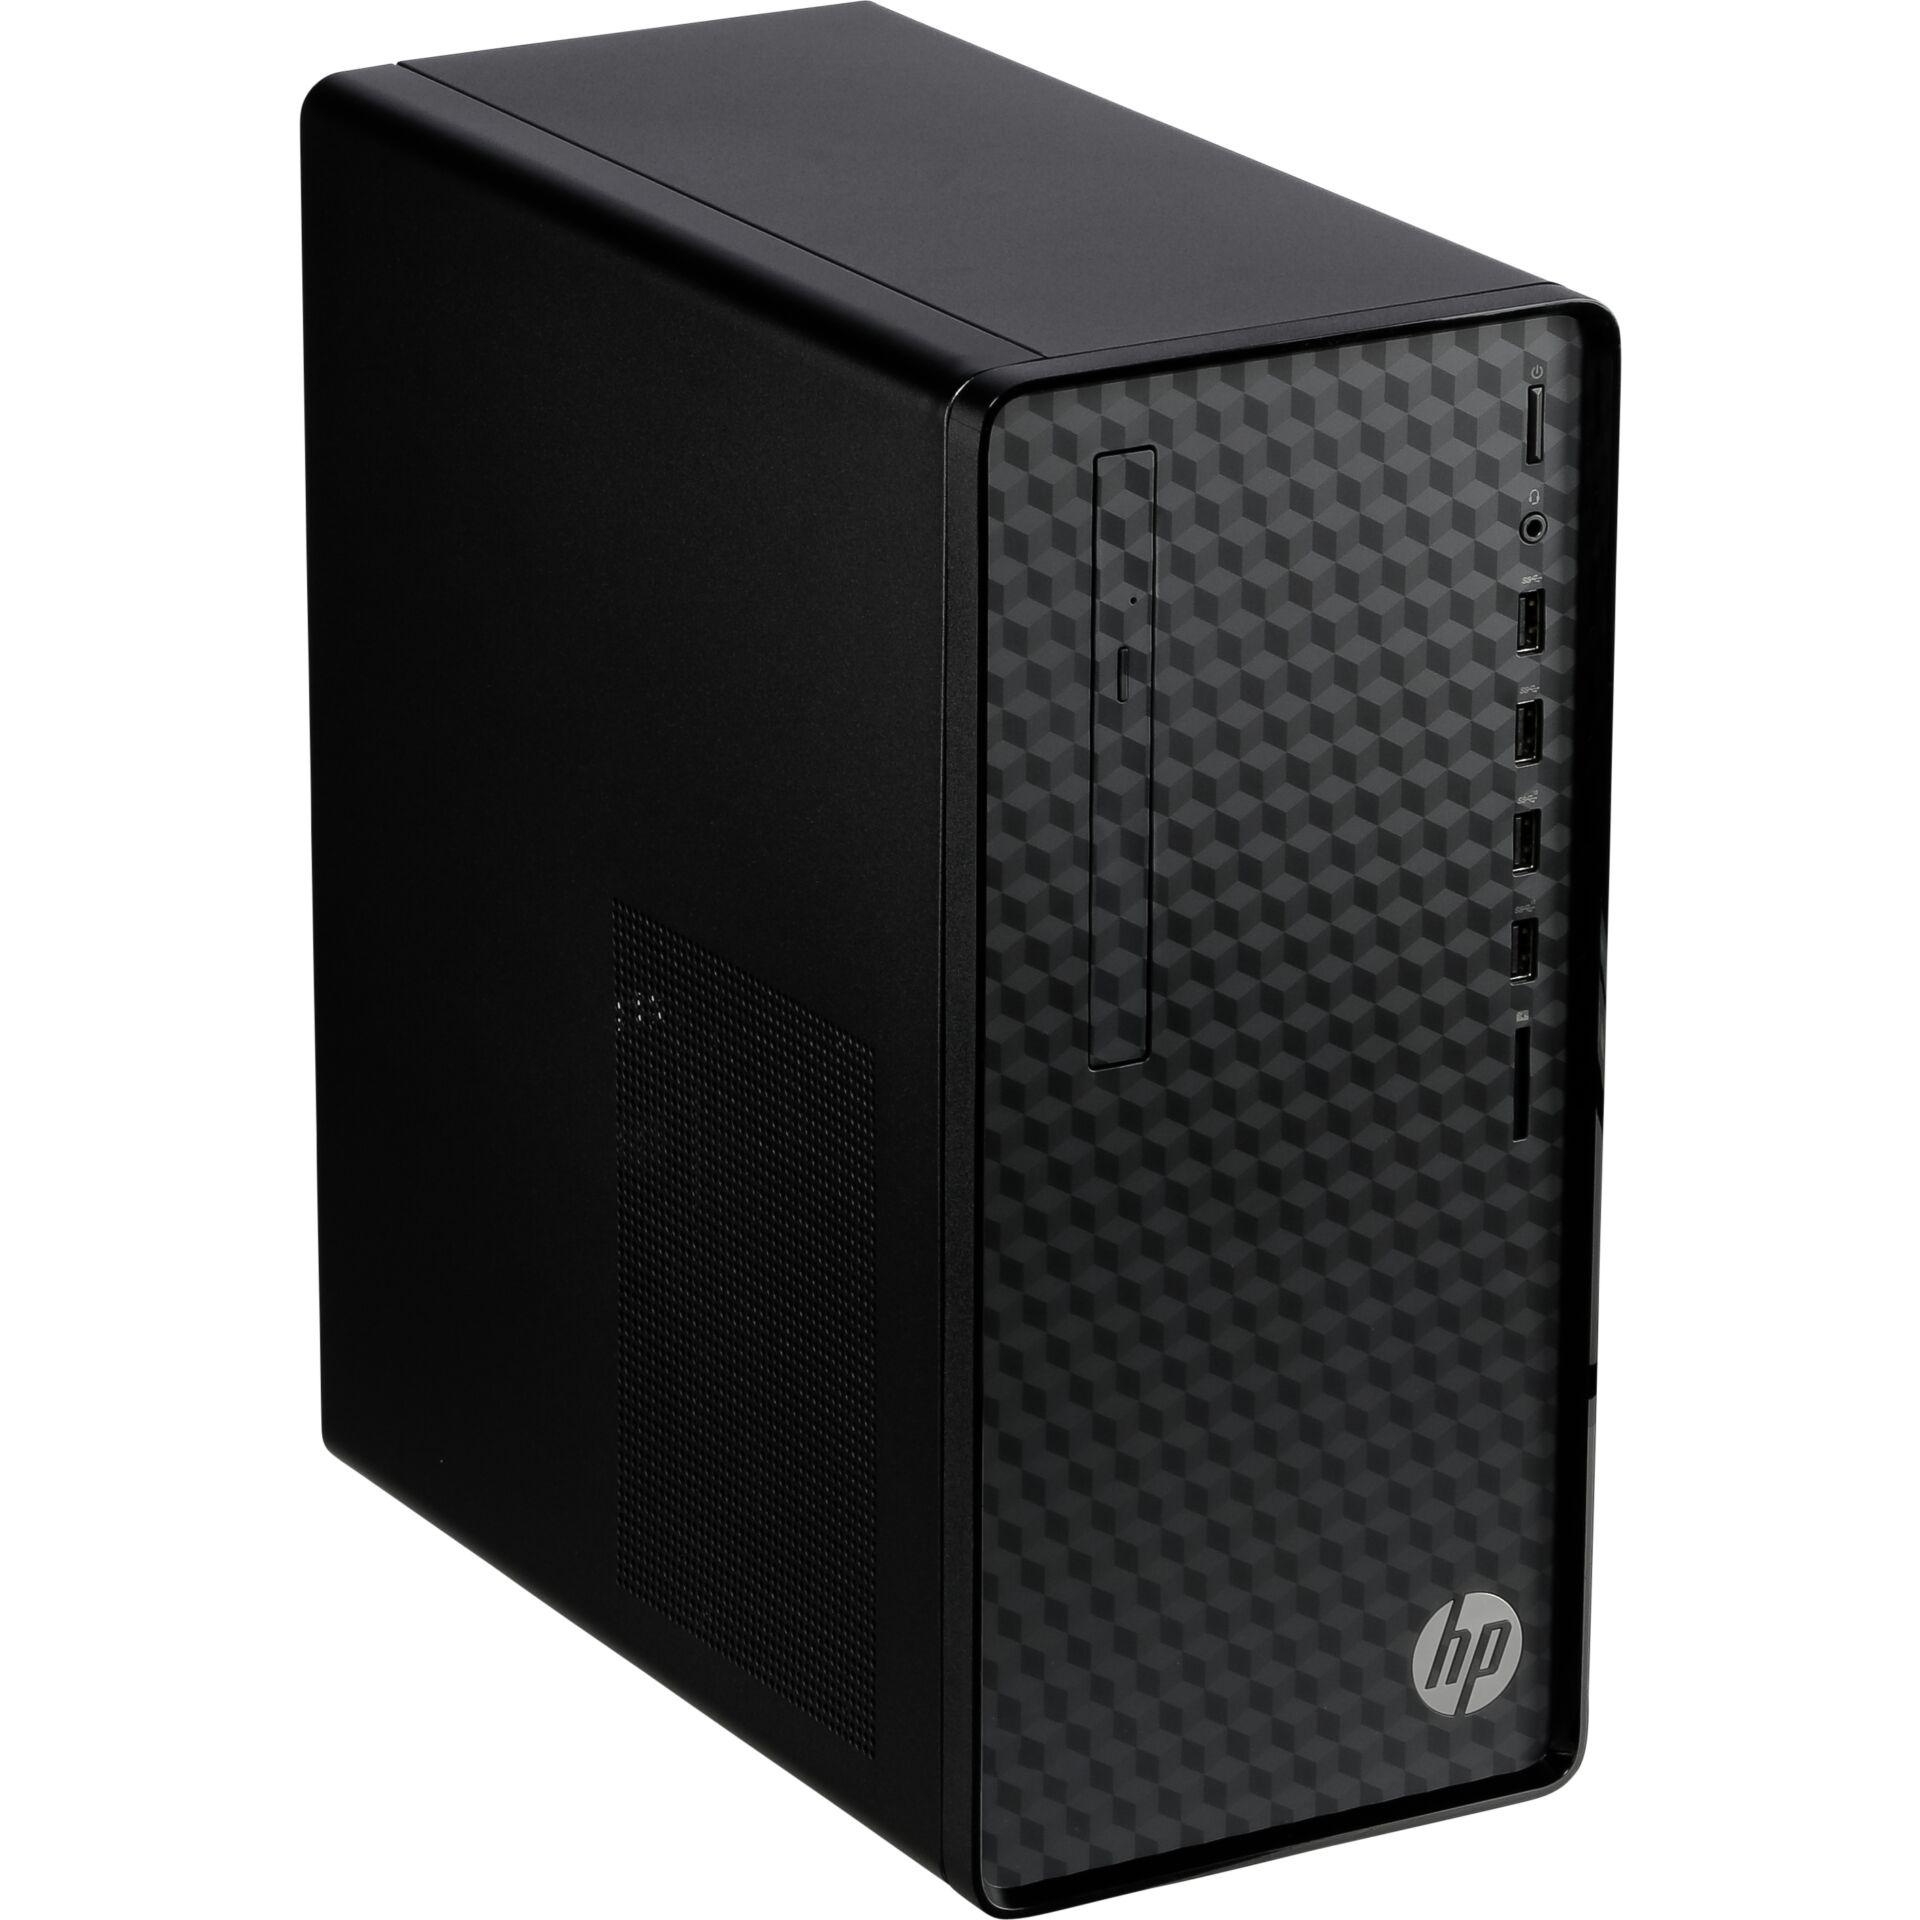 HP M01-F0601ng Ryzen 5 16GB 1TB 256GB Win 10